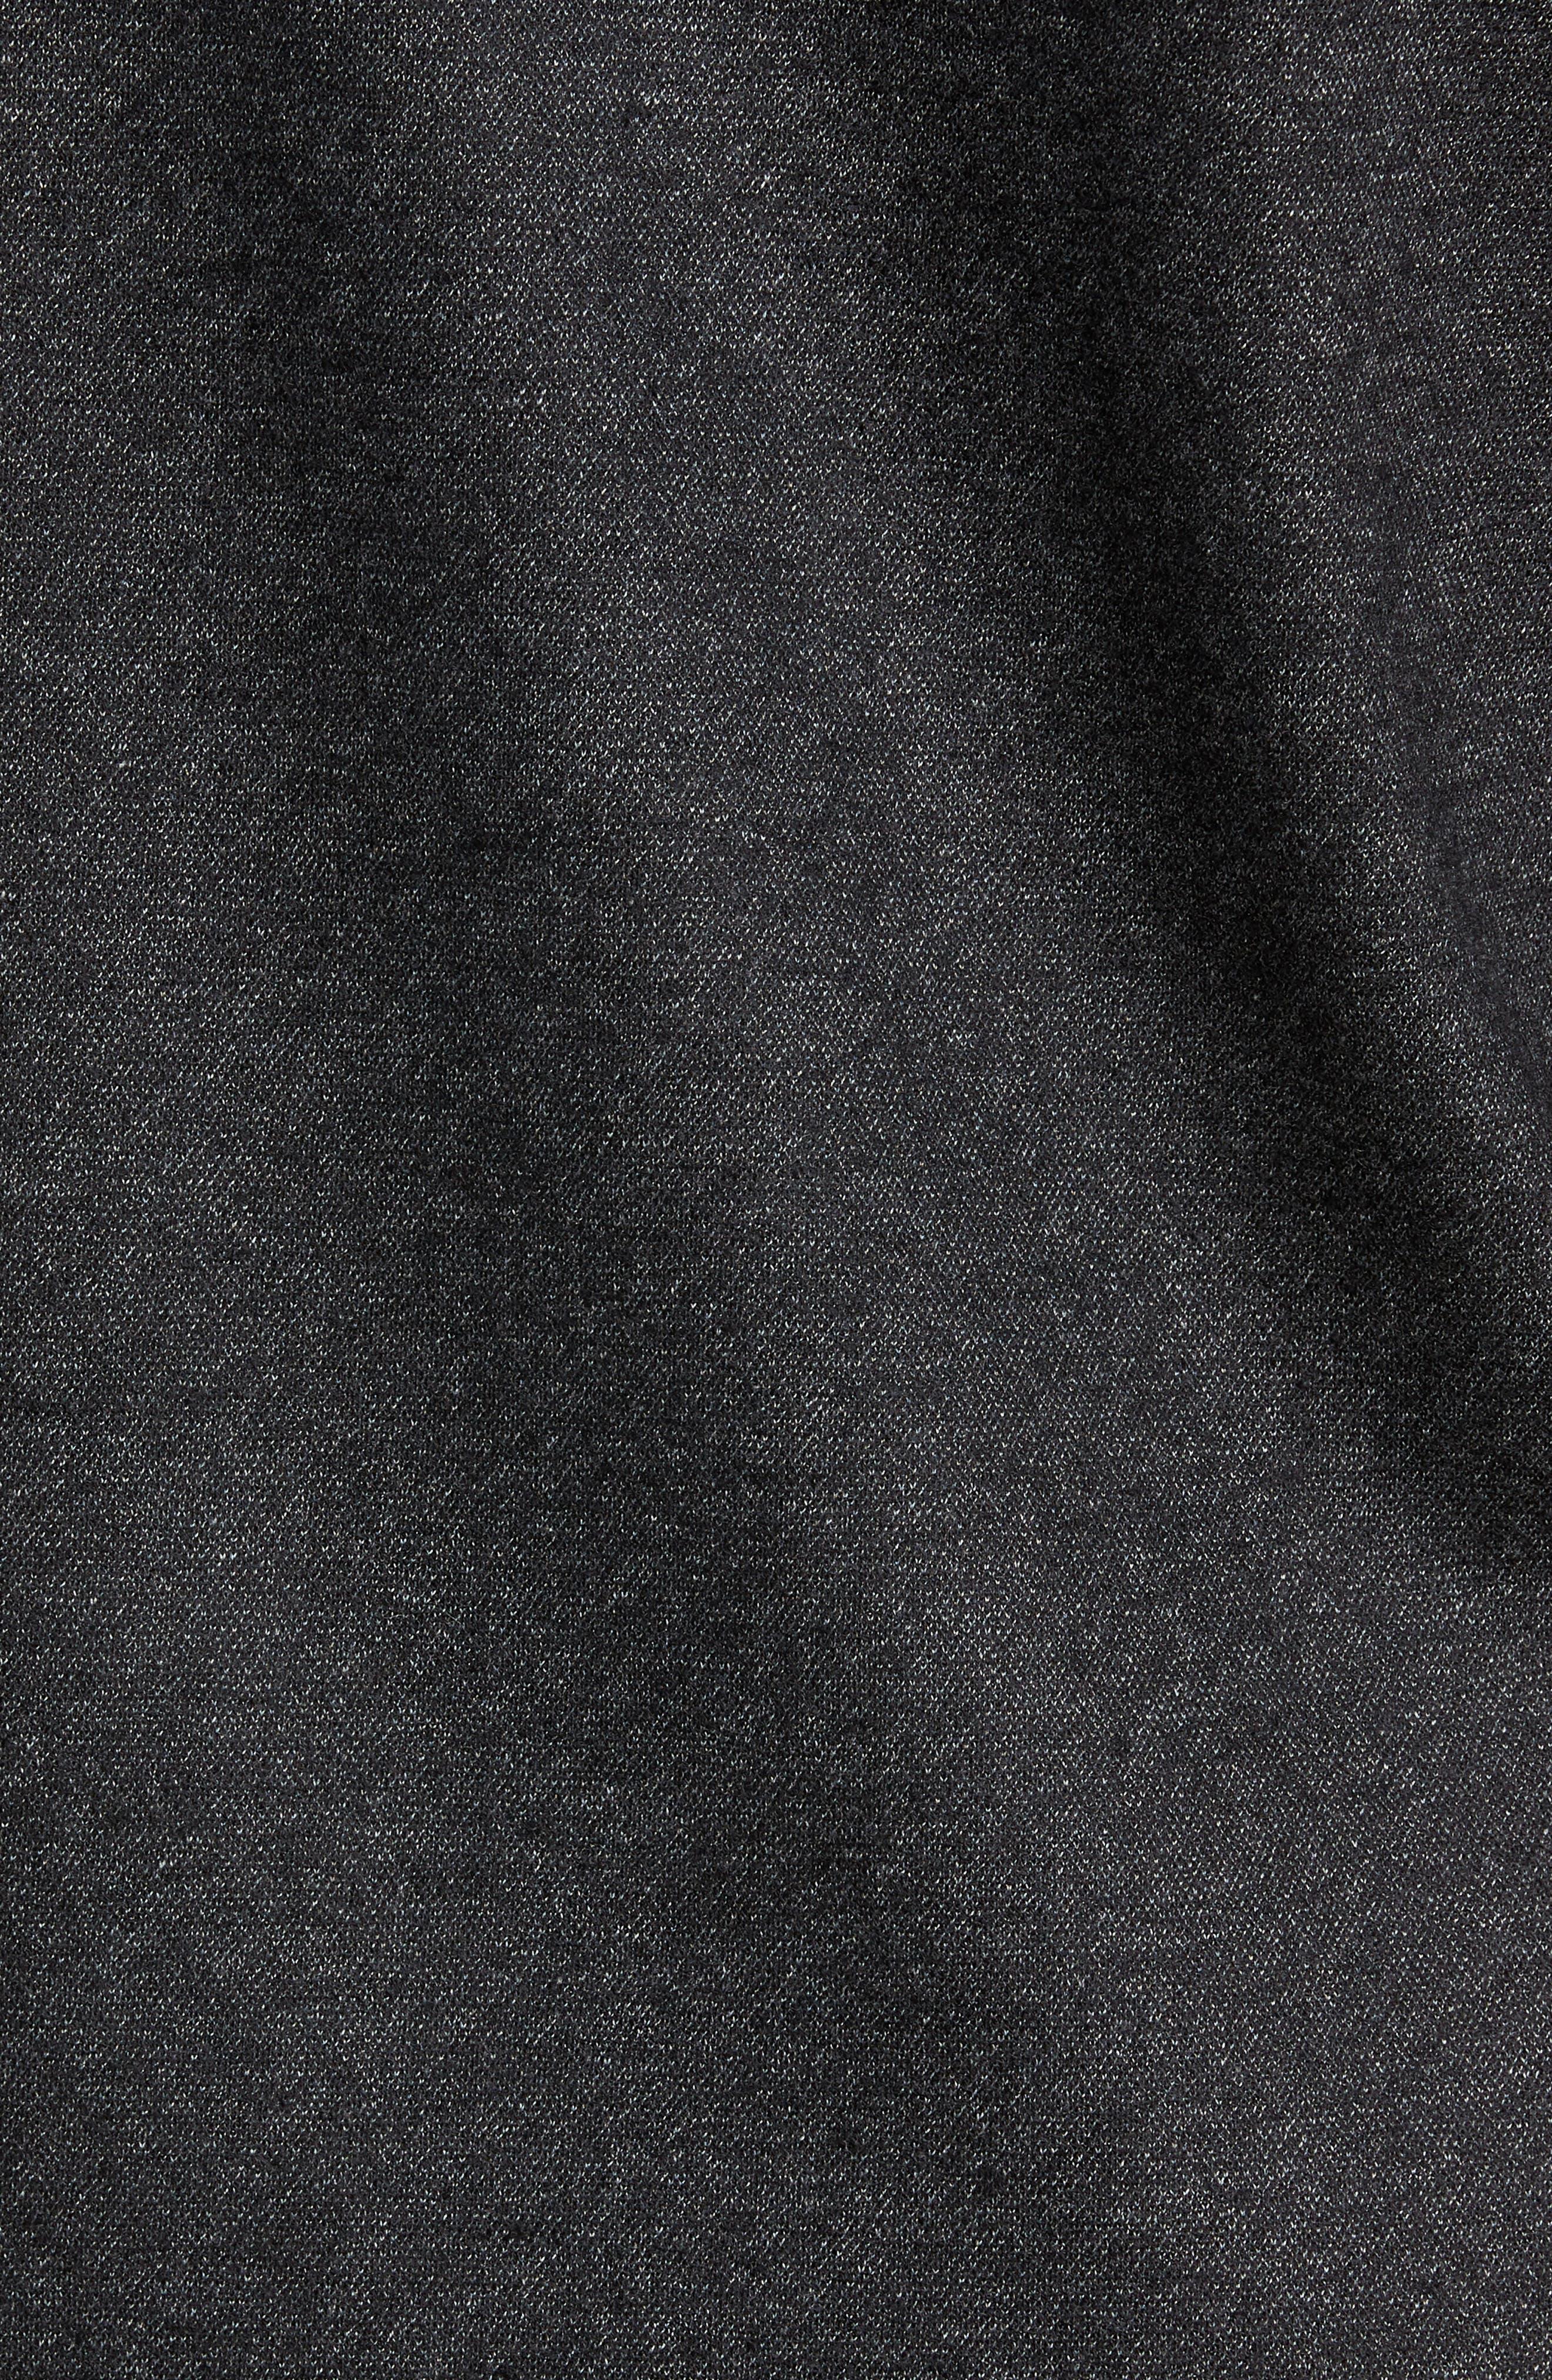 Crewneck Wool Blend Sweater,                             Alternate thumbnail 5, color,                             MEDIUM BLACK